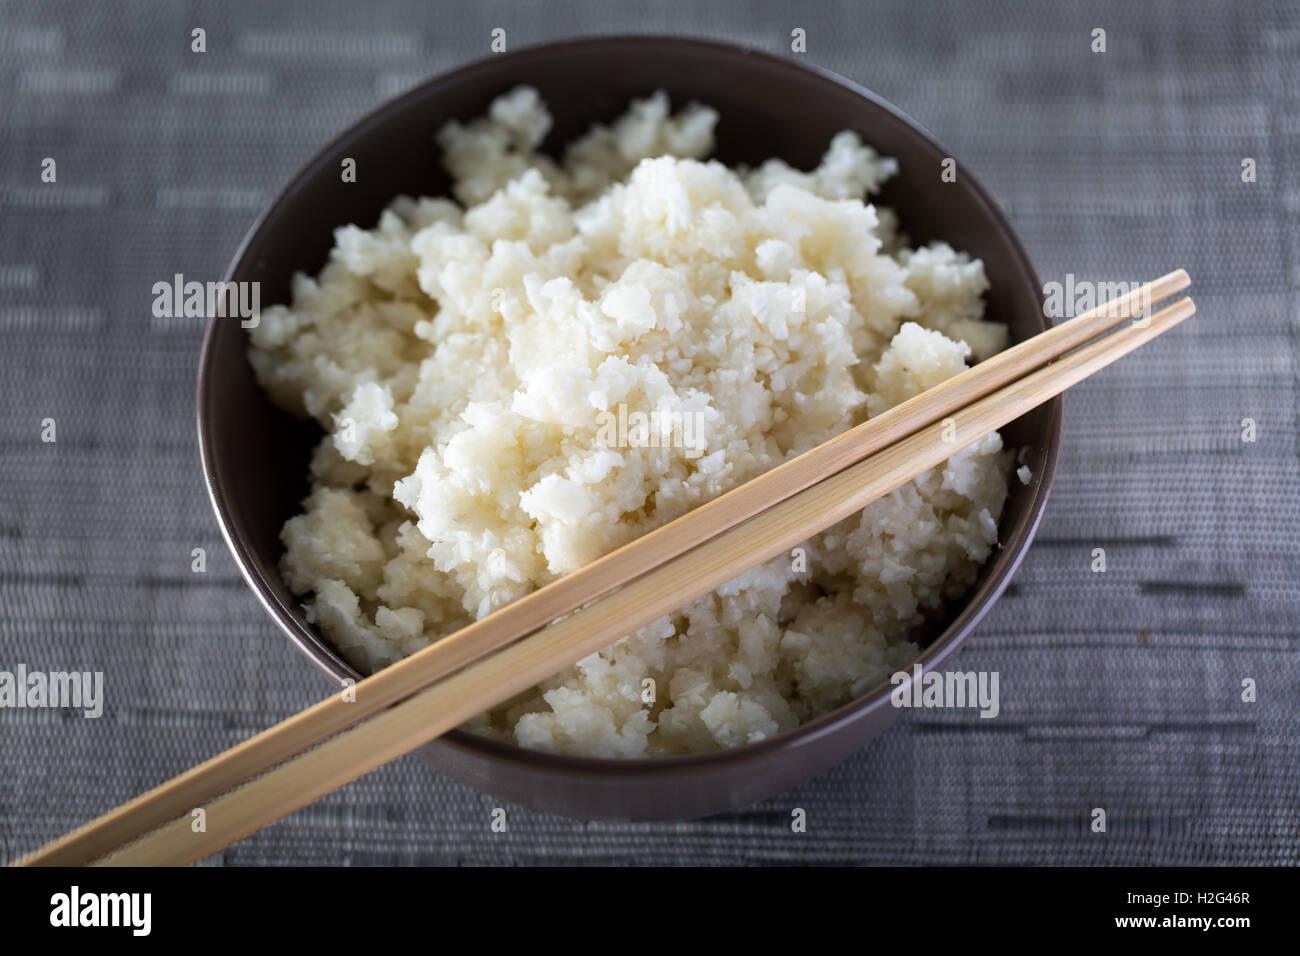 Eine Schüssel Blumenkohl Reis Stockbild